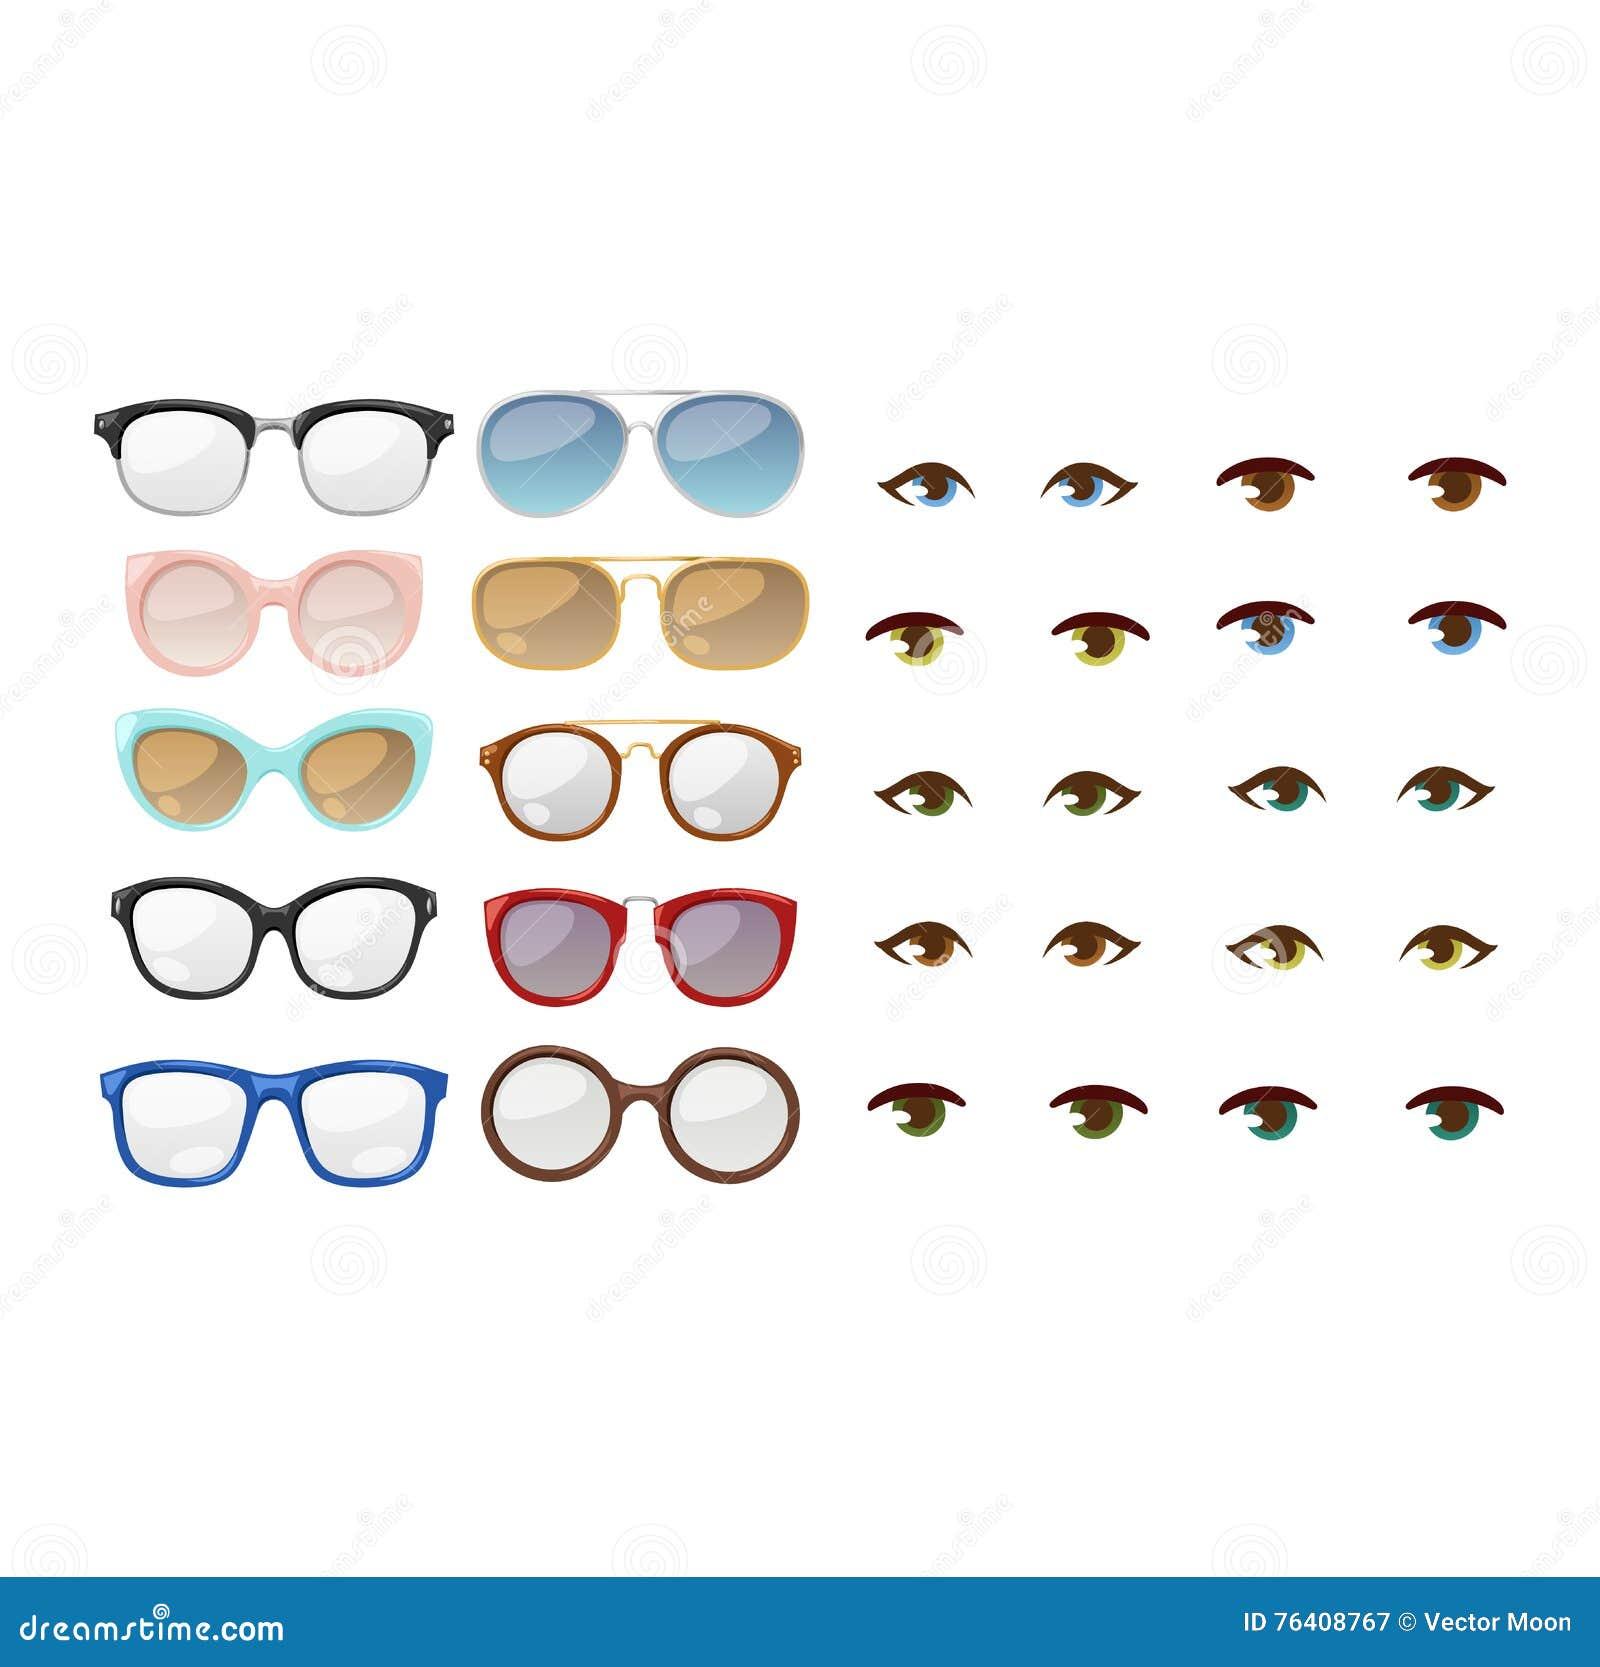 Glasses Human Eye Vector Stock Vector Illustration Of Chart 76408767